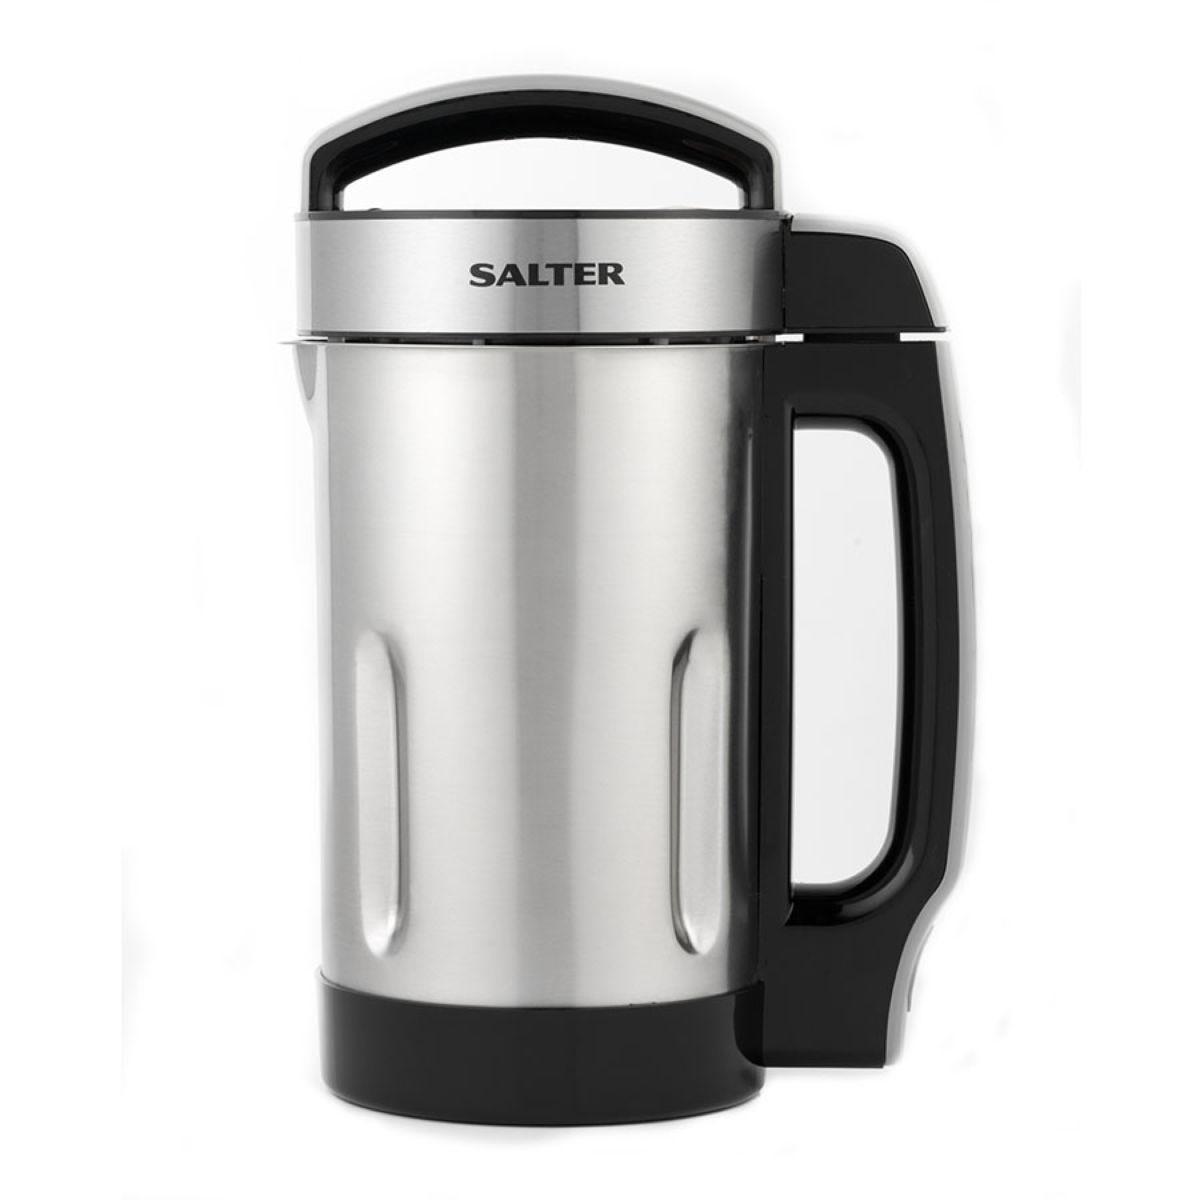 Salter 1.6L Electric Soup Maker Jug - Stainless Steel